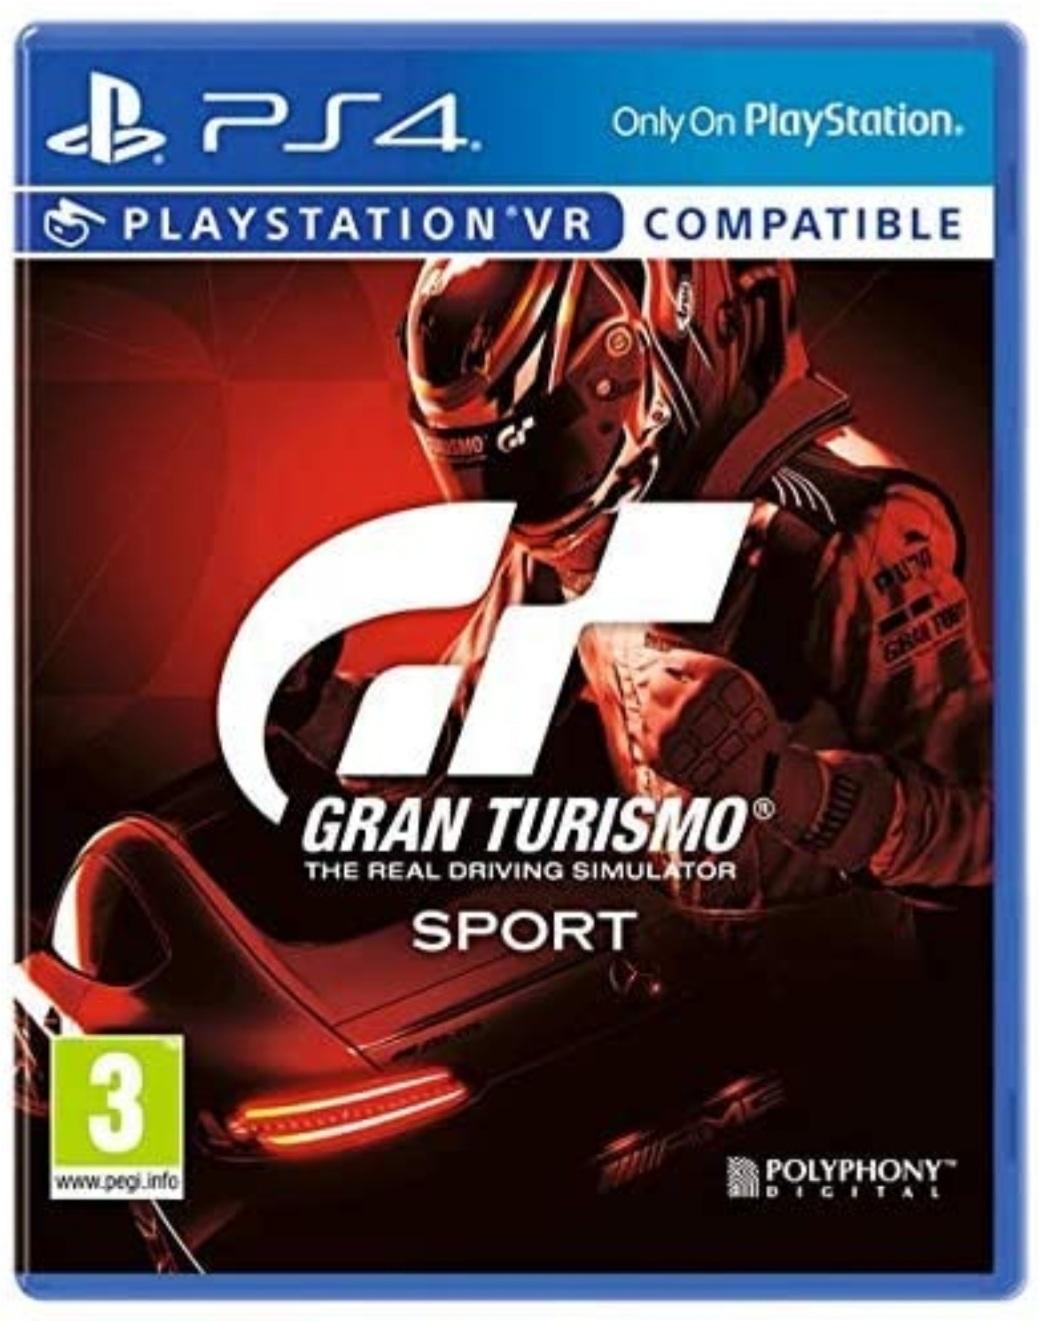 Gran Turismo: Sport   VR   Playstation 4